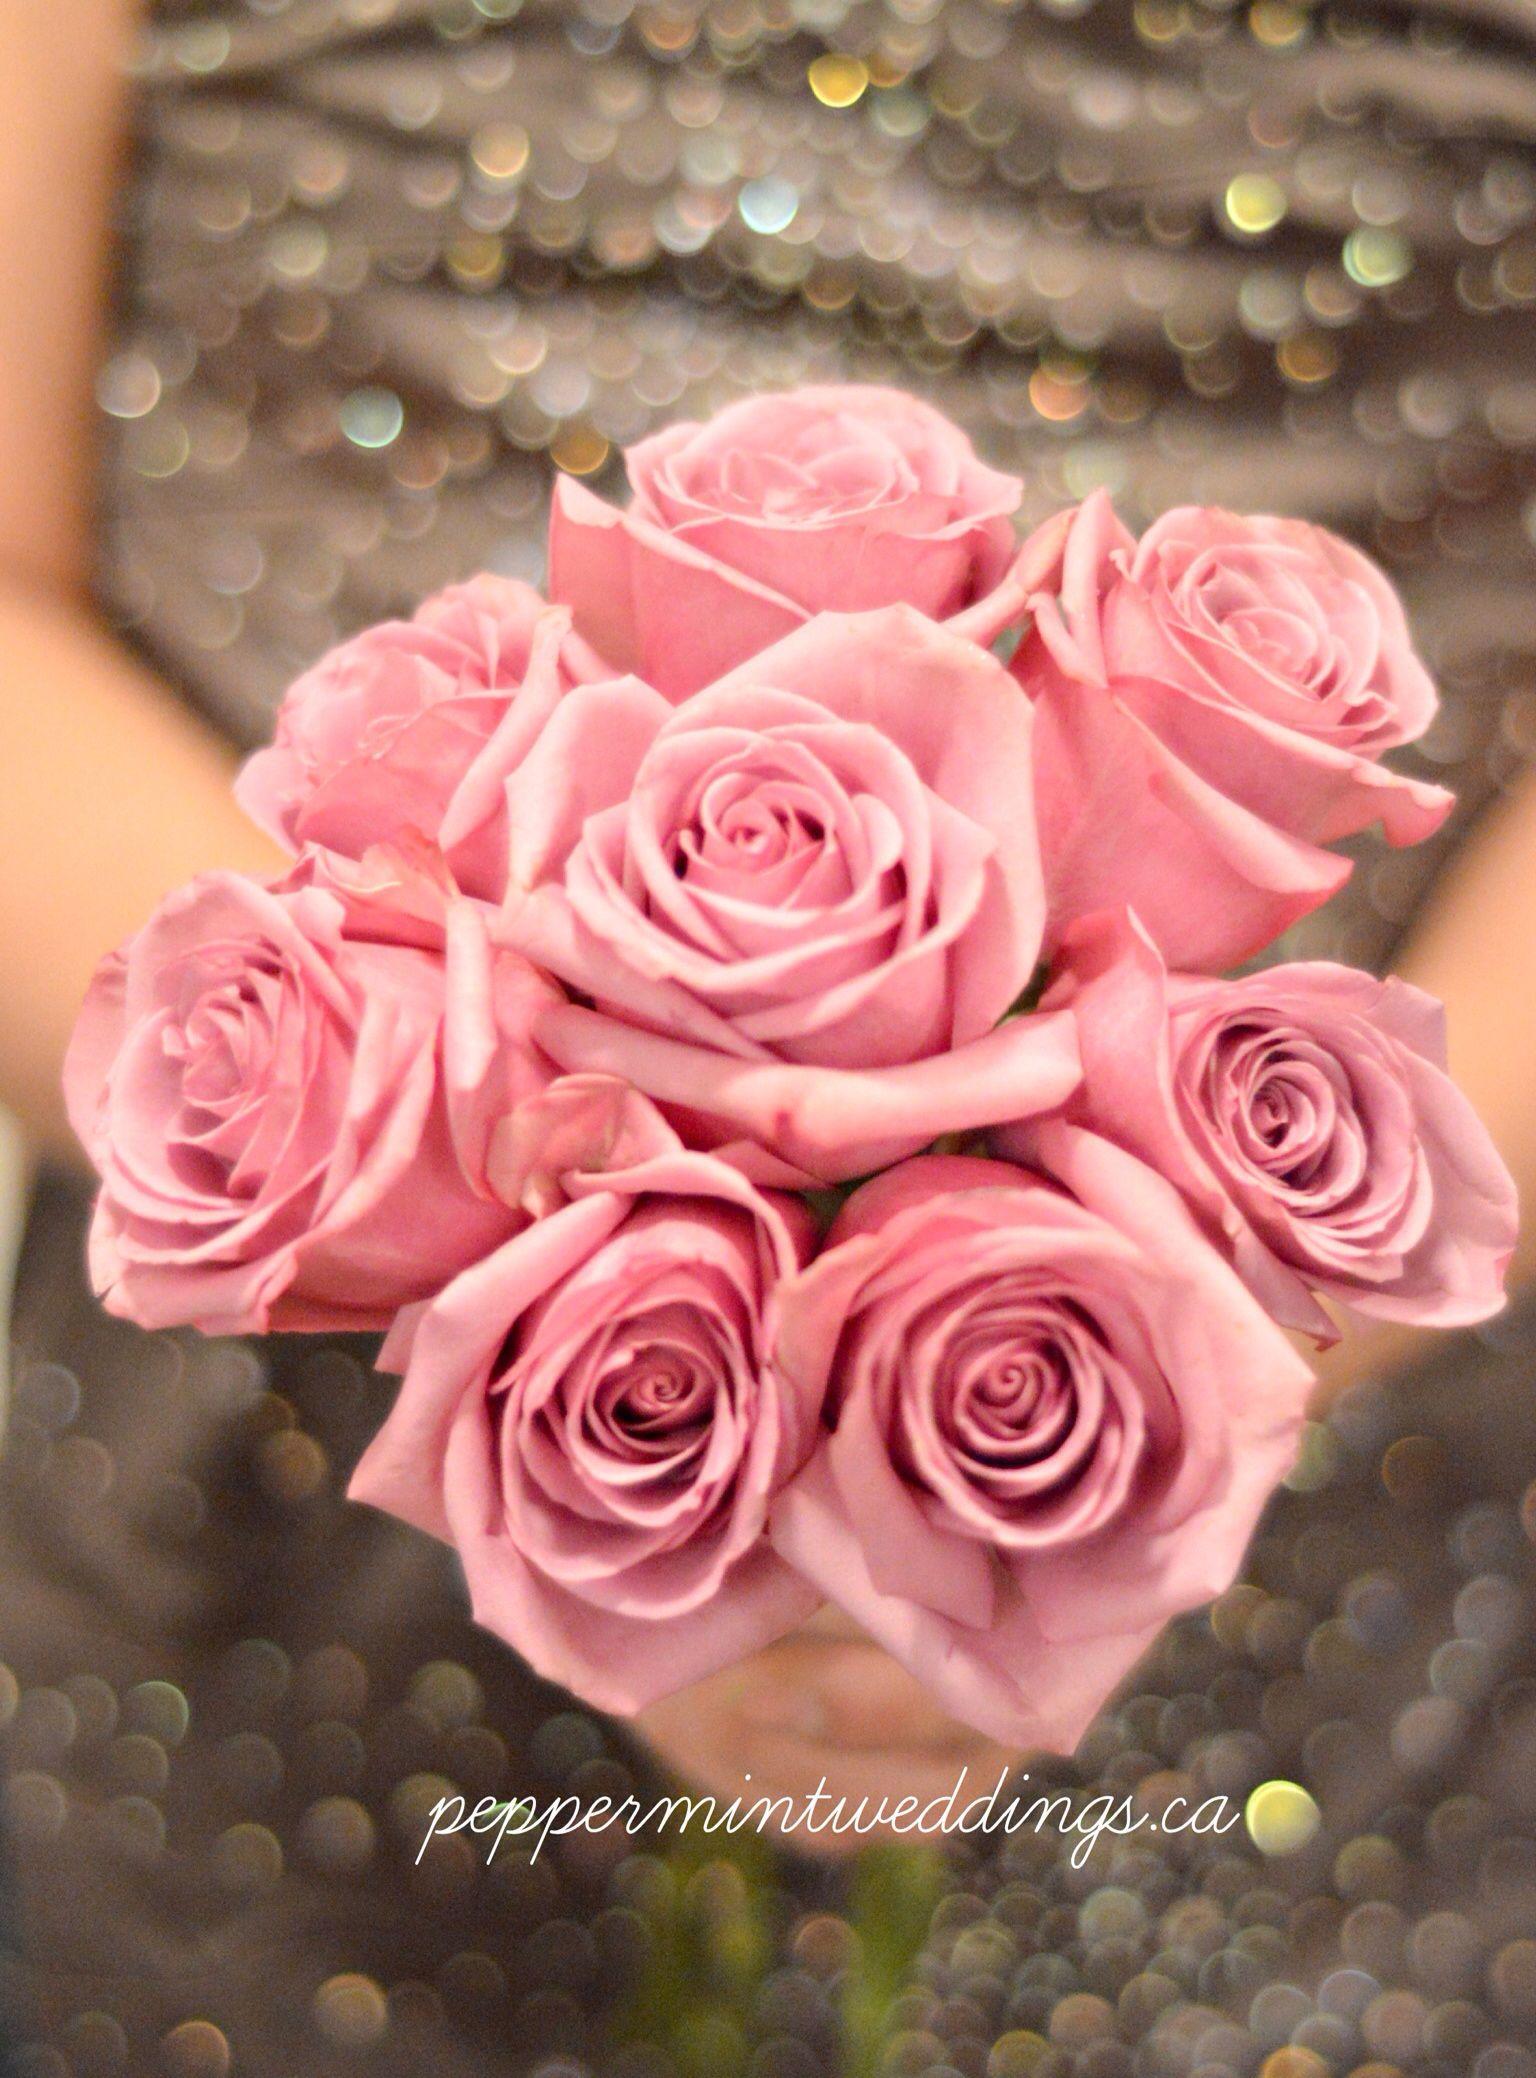 Rose bouquet classic elegant beautiful wedding bouquet toronto rose bouquet classic elegant beautiful wedding bouquet toronto weddings toronto wedding floral peppermint weddings izmirmasajfo